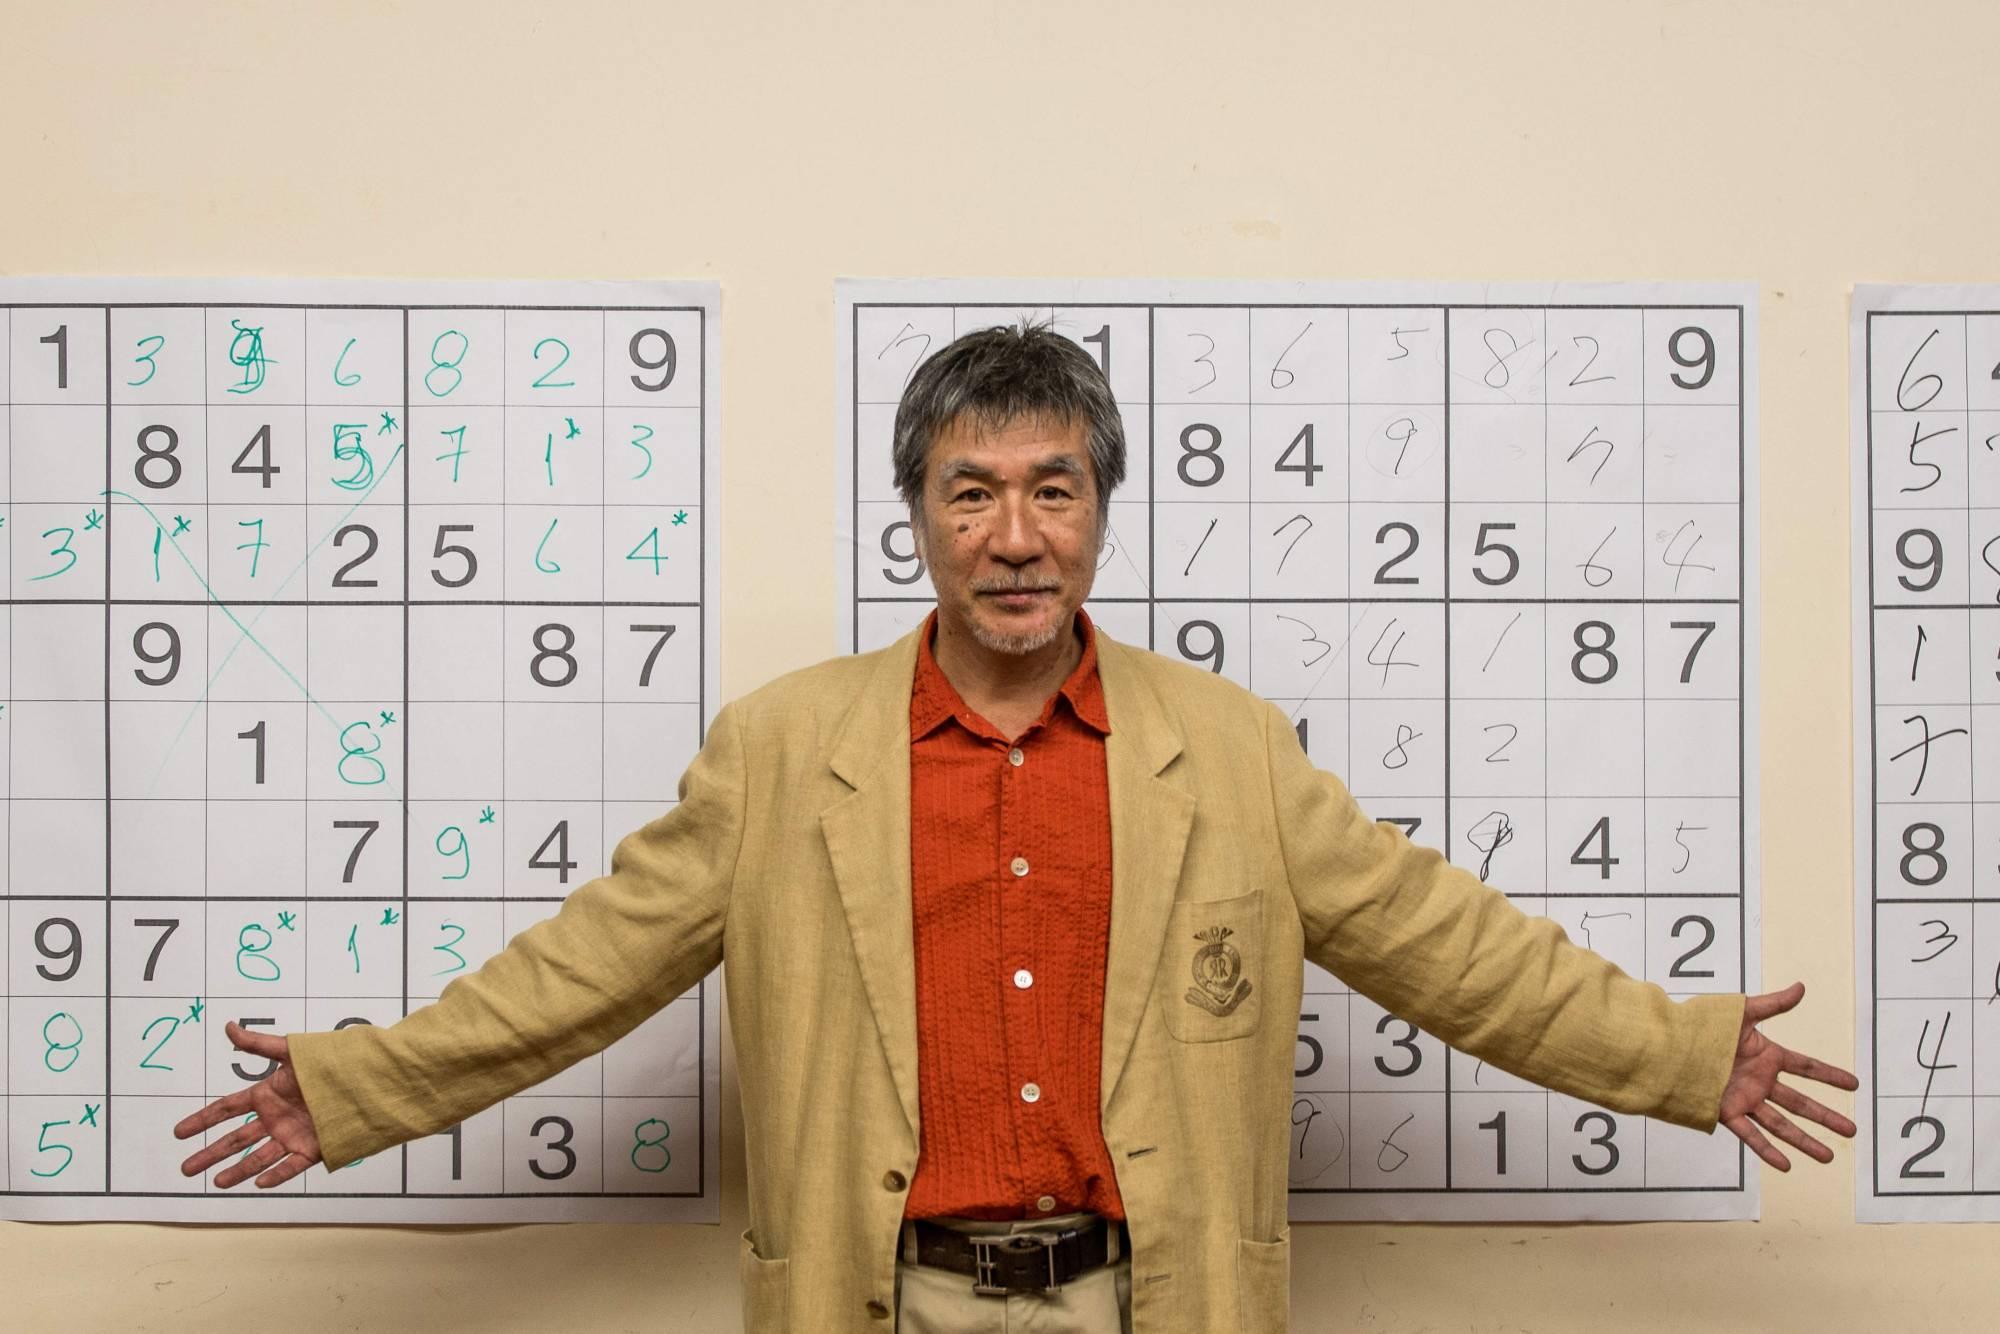 np file 106539 Maki Kaji, creator of Sudoku dies aged 69